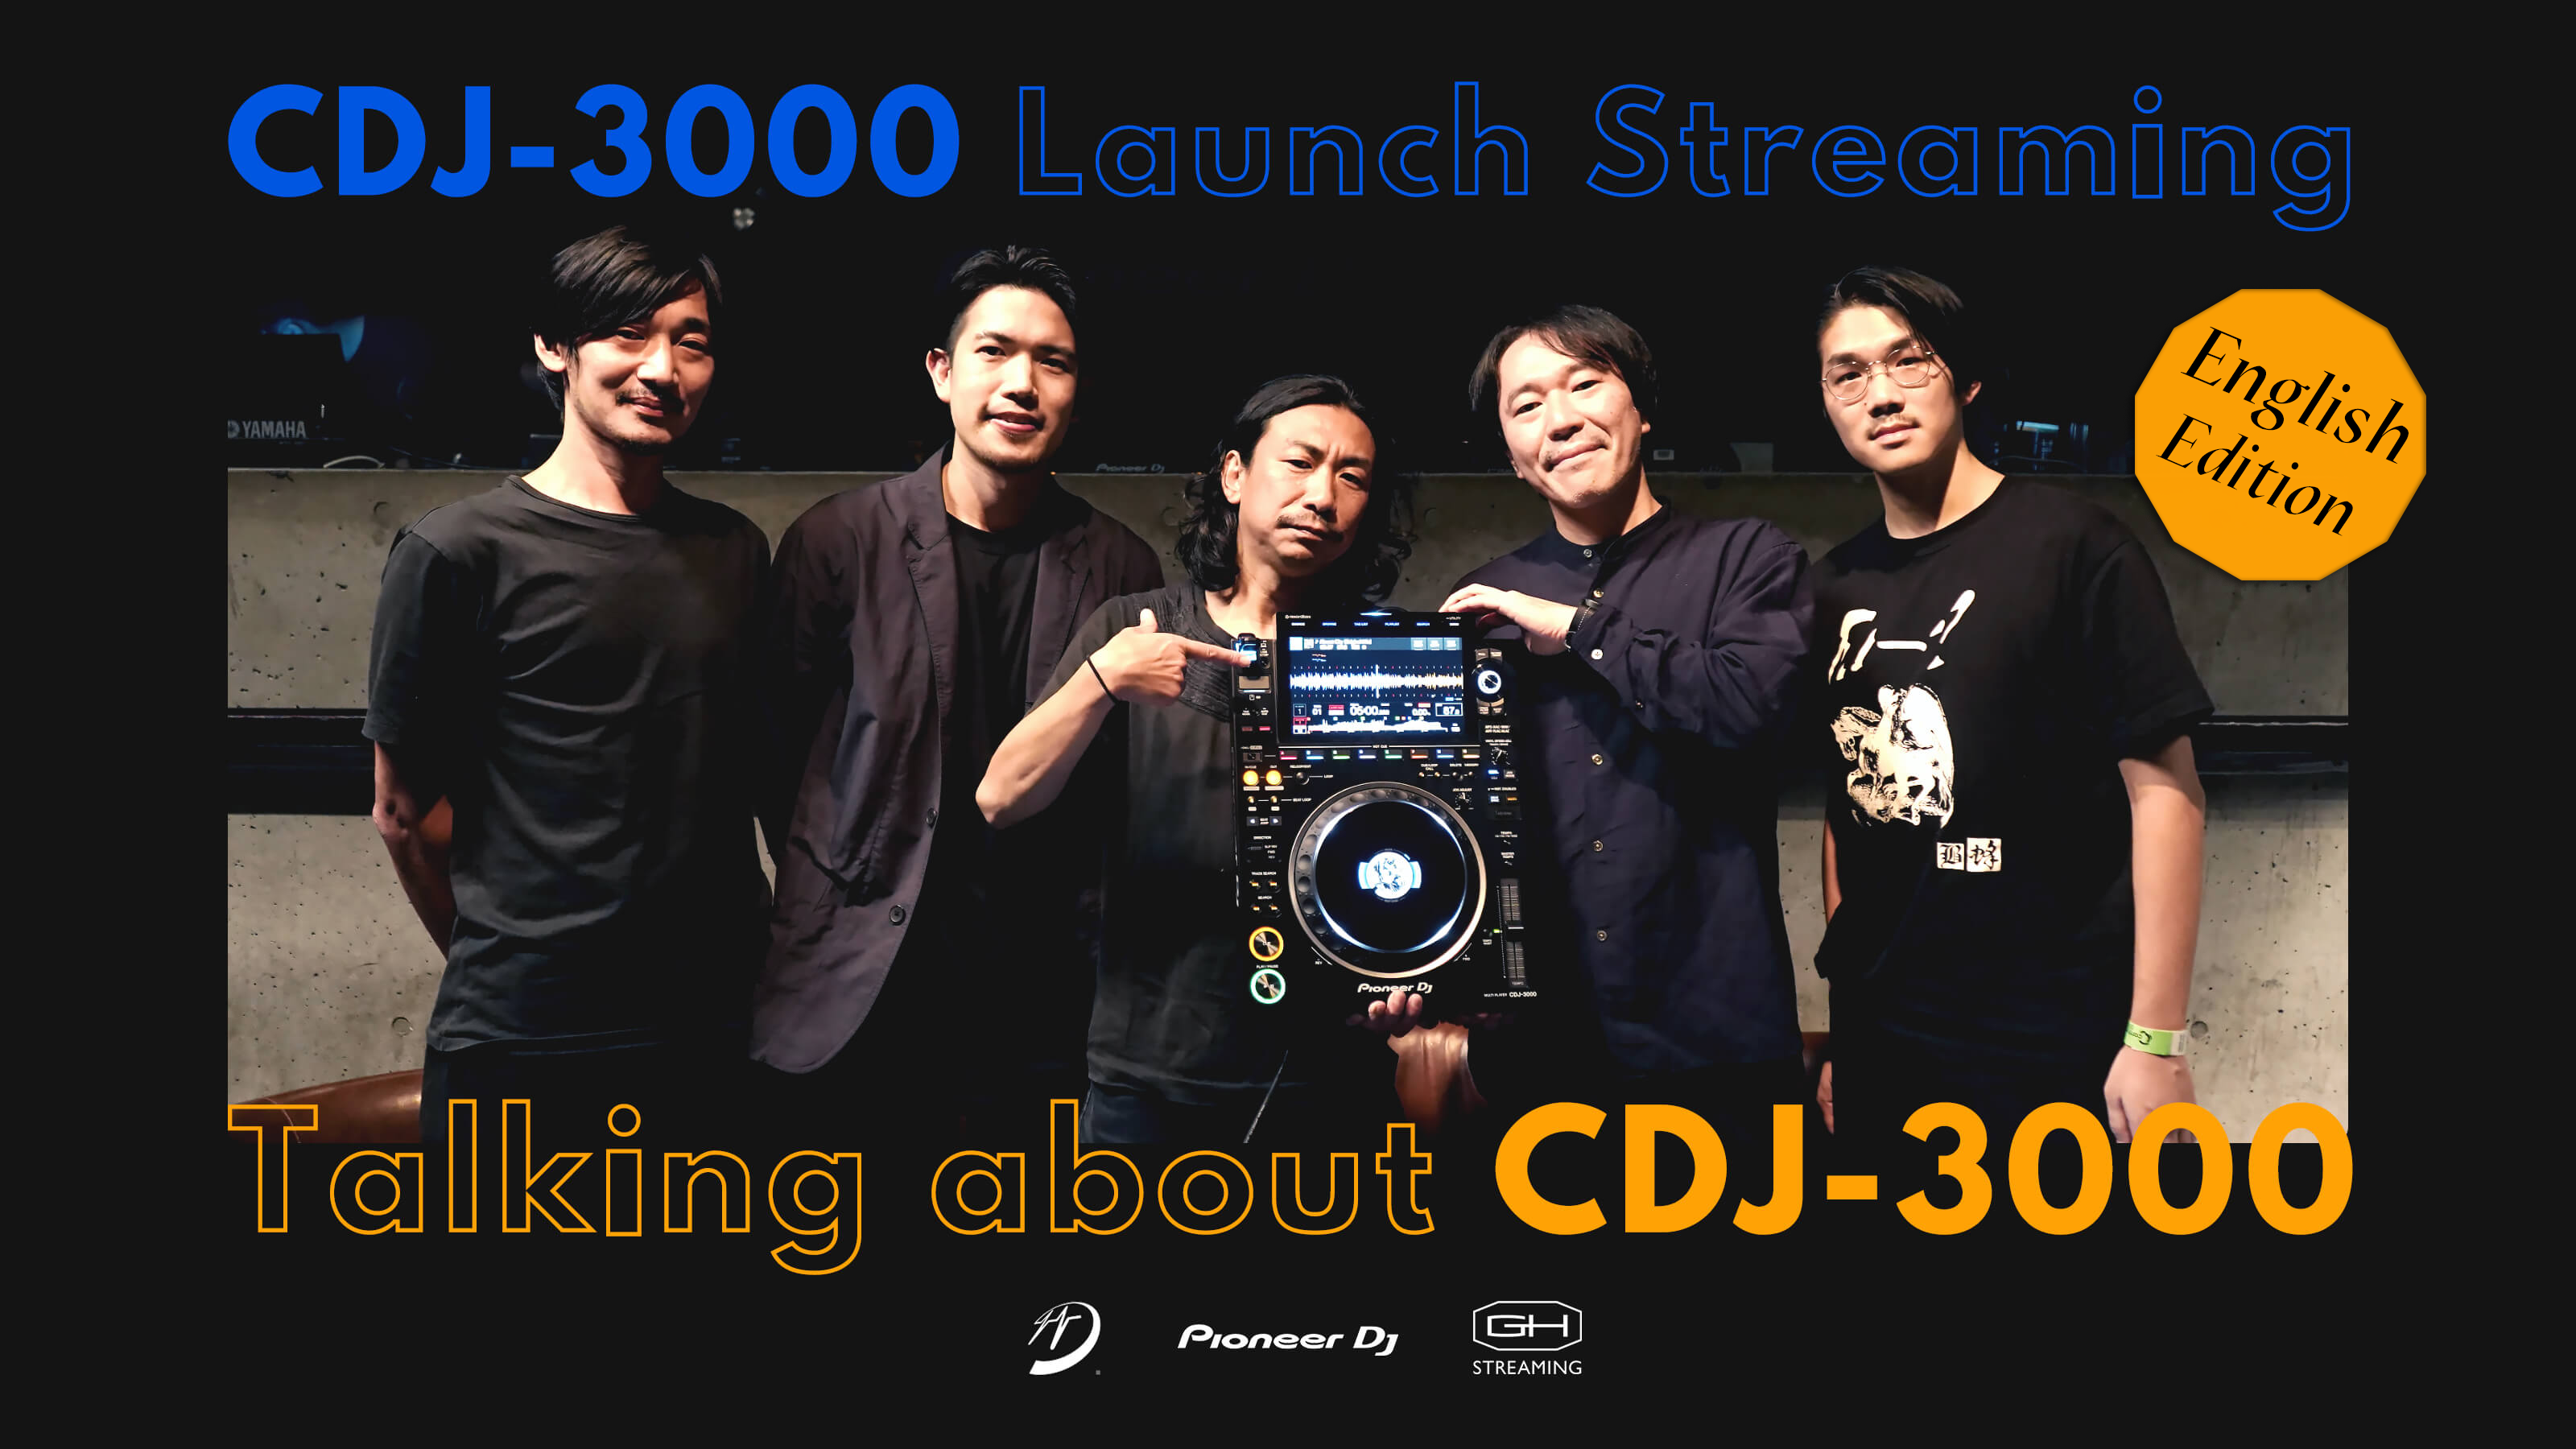 """Talking about CDJ-3000"" // cut from Pioneer DJ CDJ-3000 Launch Streaming"